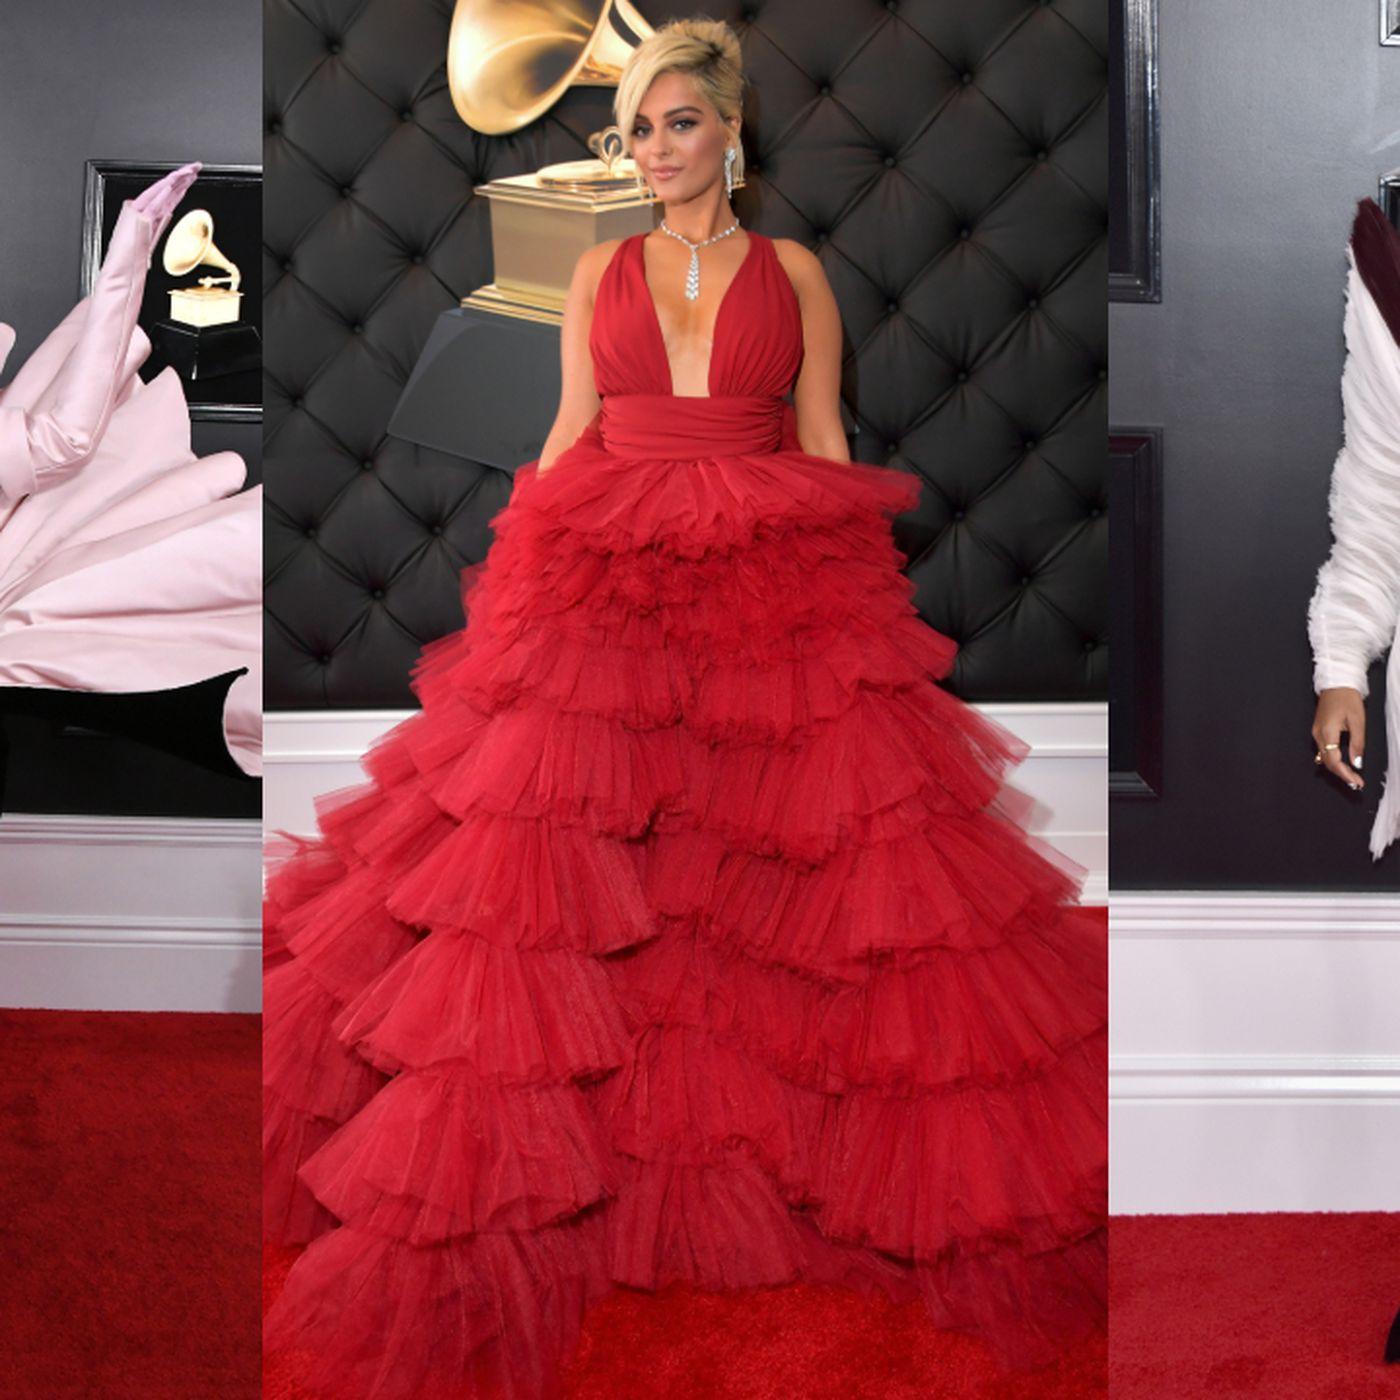 Grammys 2019 red carpet: Cardi B, Bebe Rexha, and more ...